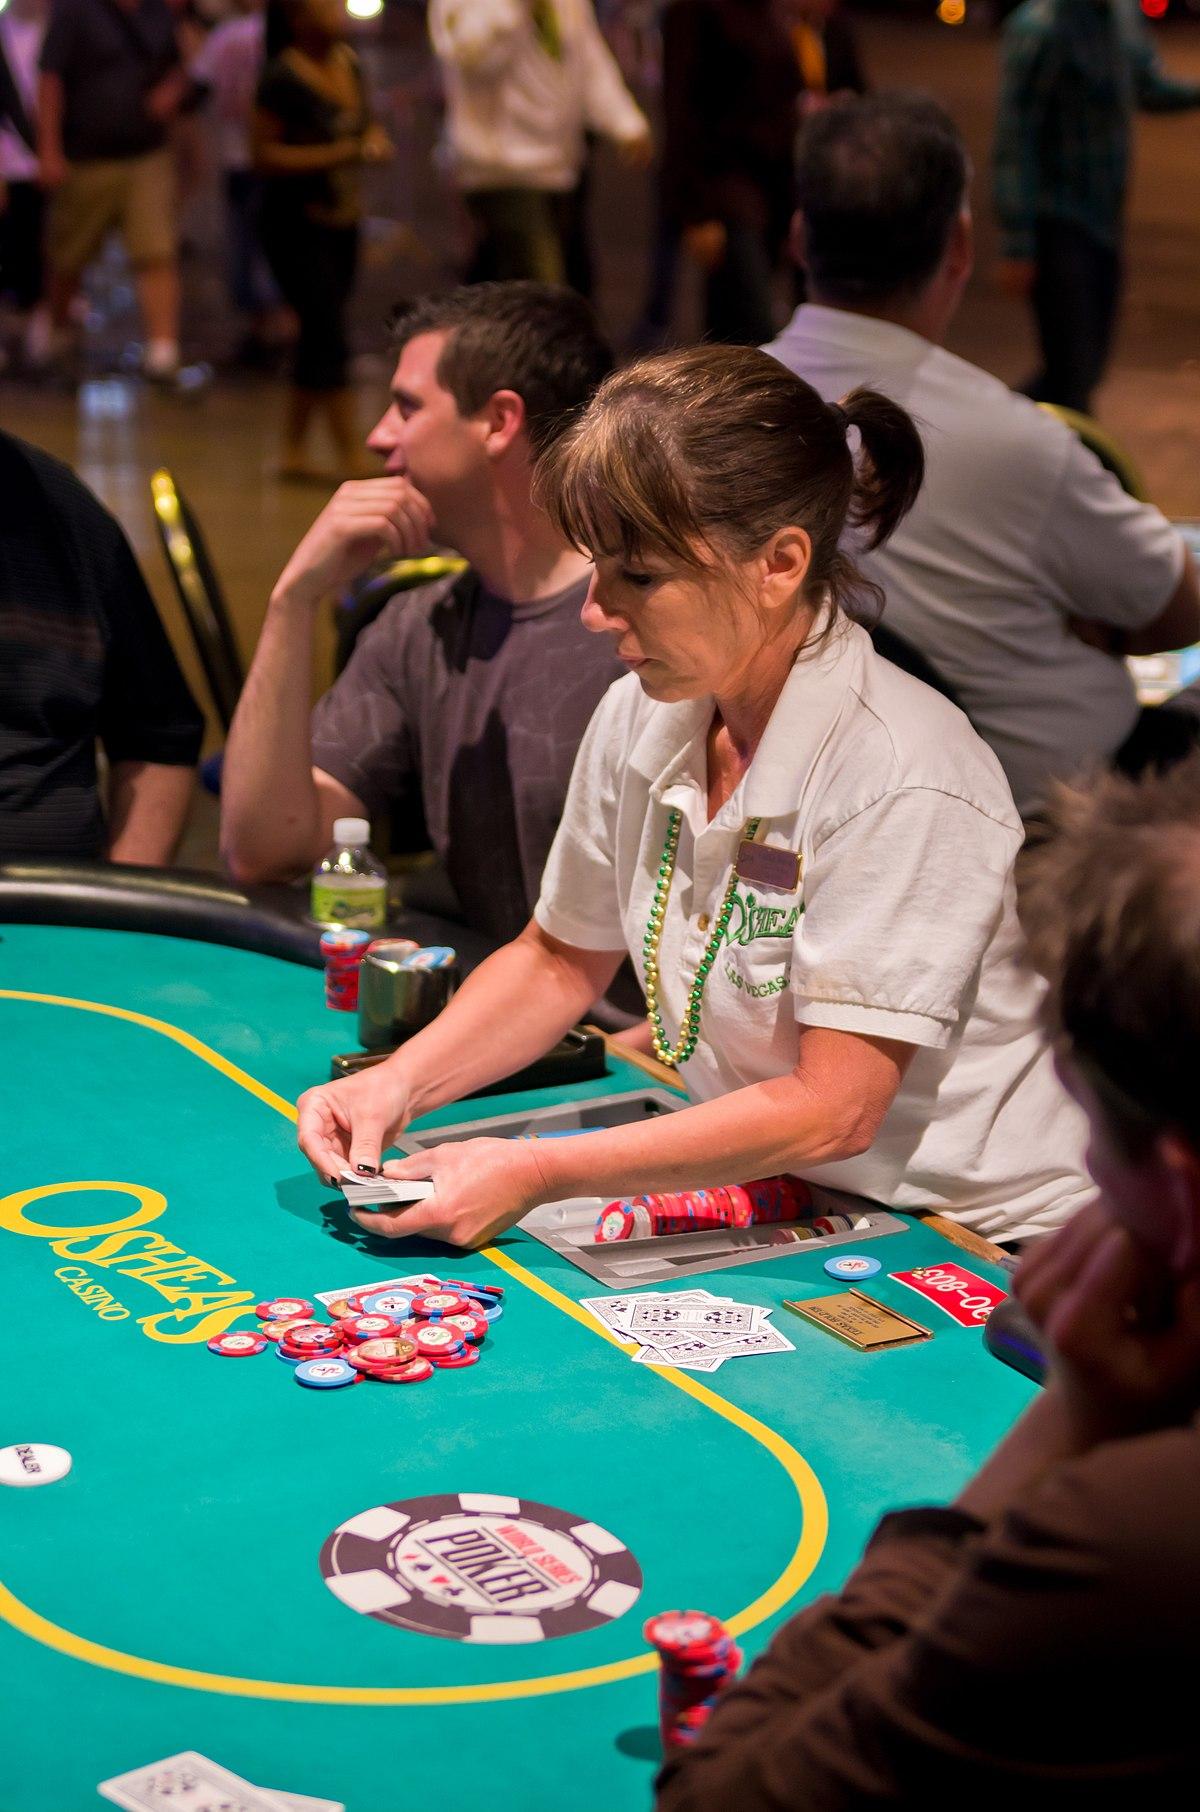 File:Poker in a casino table.jpg - Wikimedia Commons